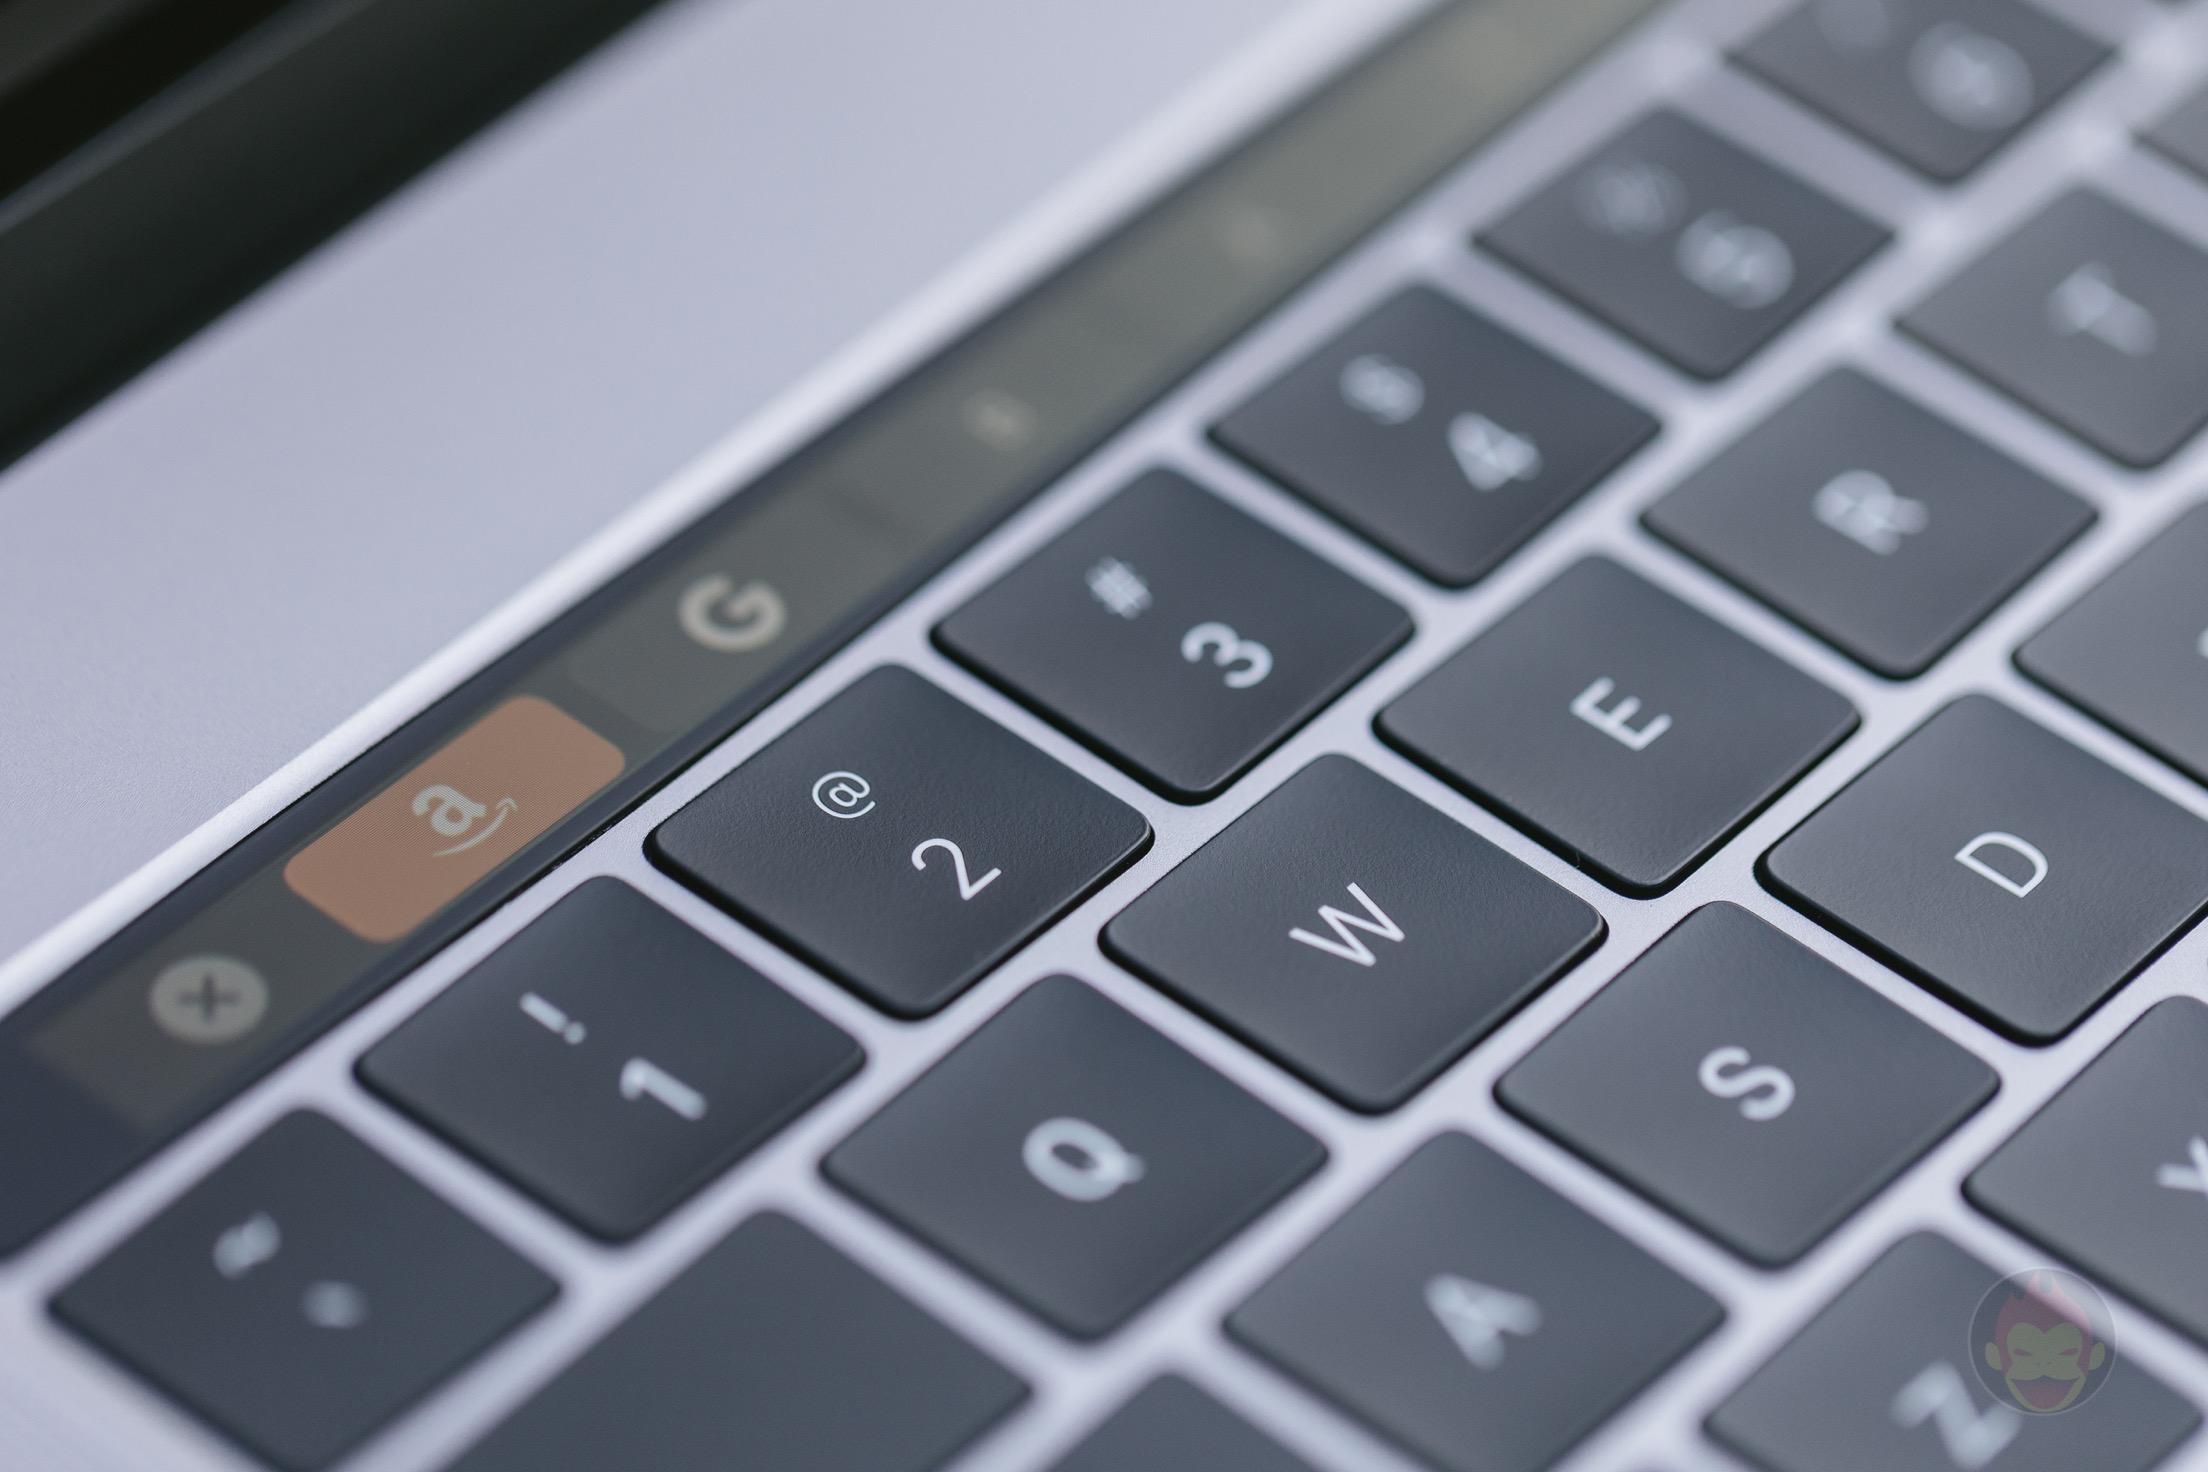 MacBook-Pro-Late2016-15inch-model-photos-13.jpg